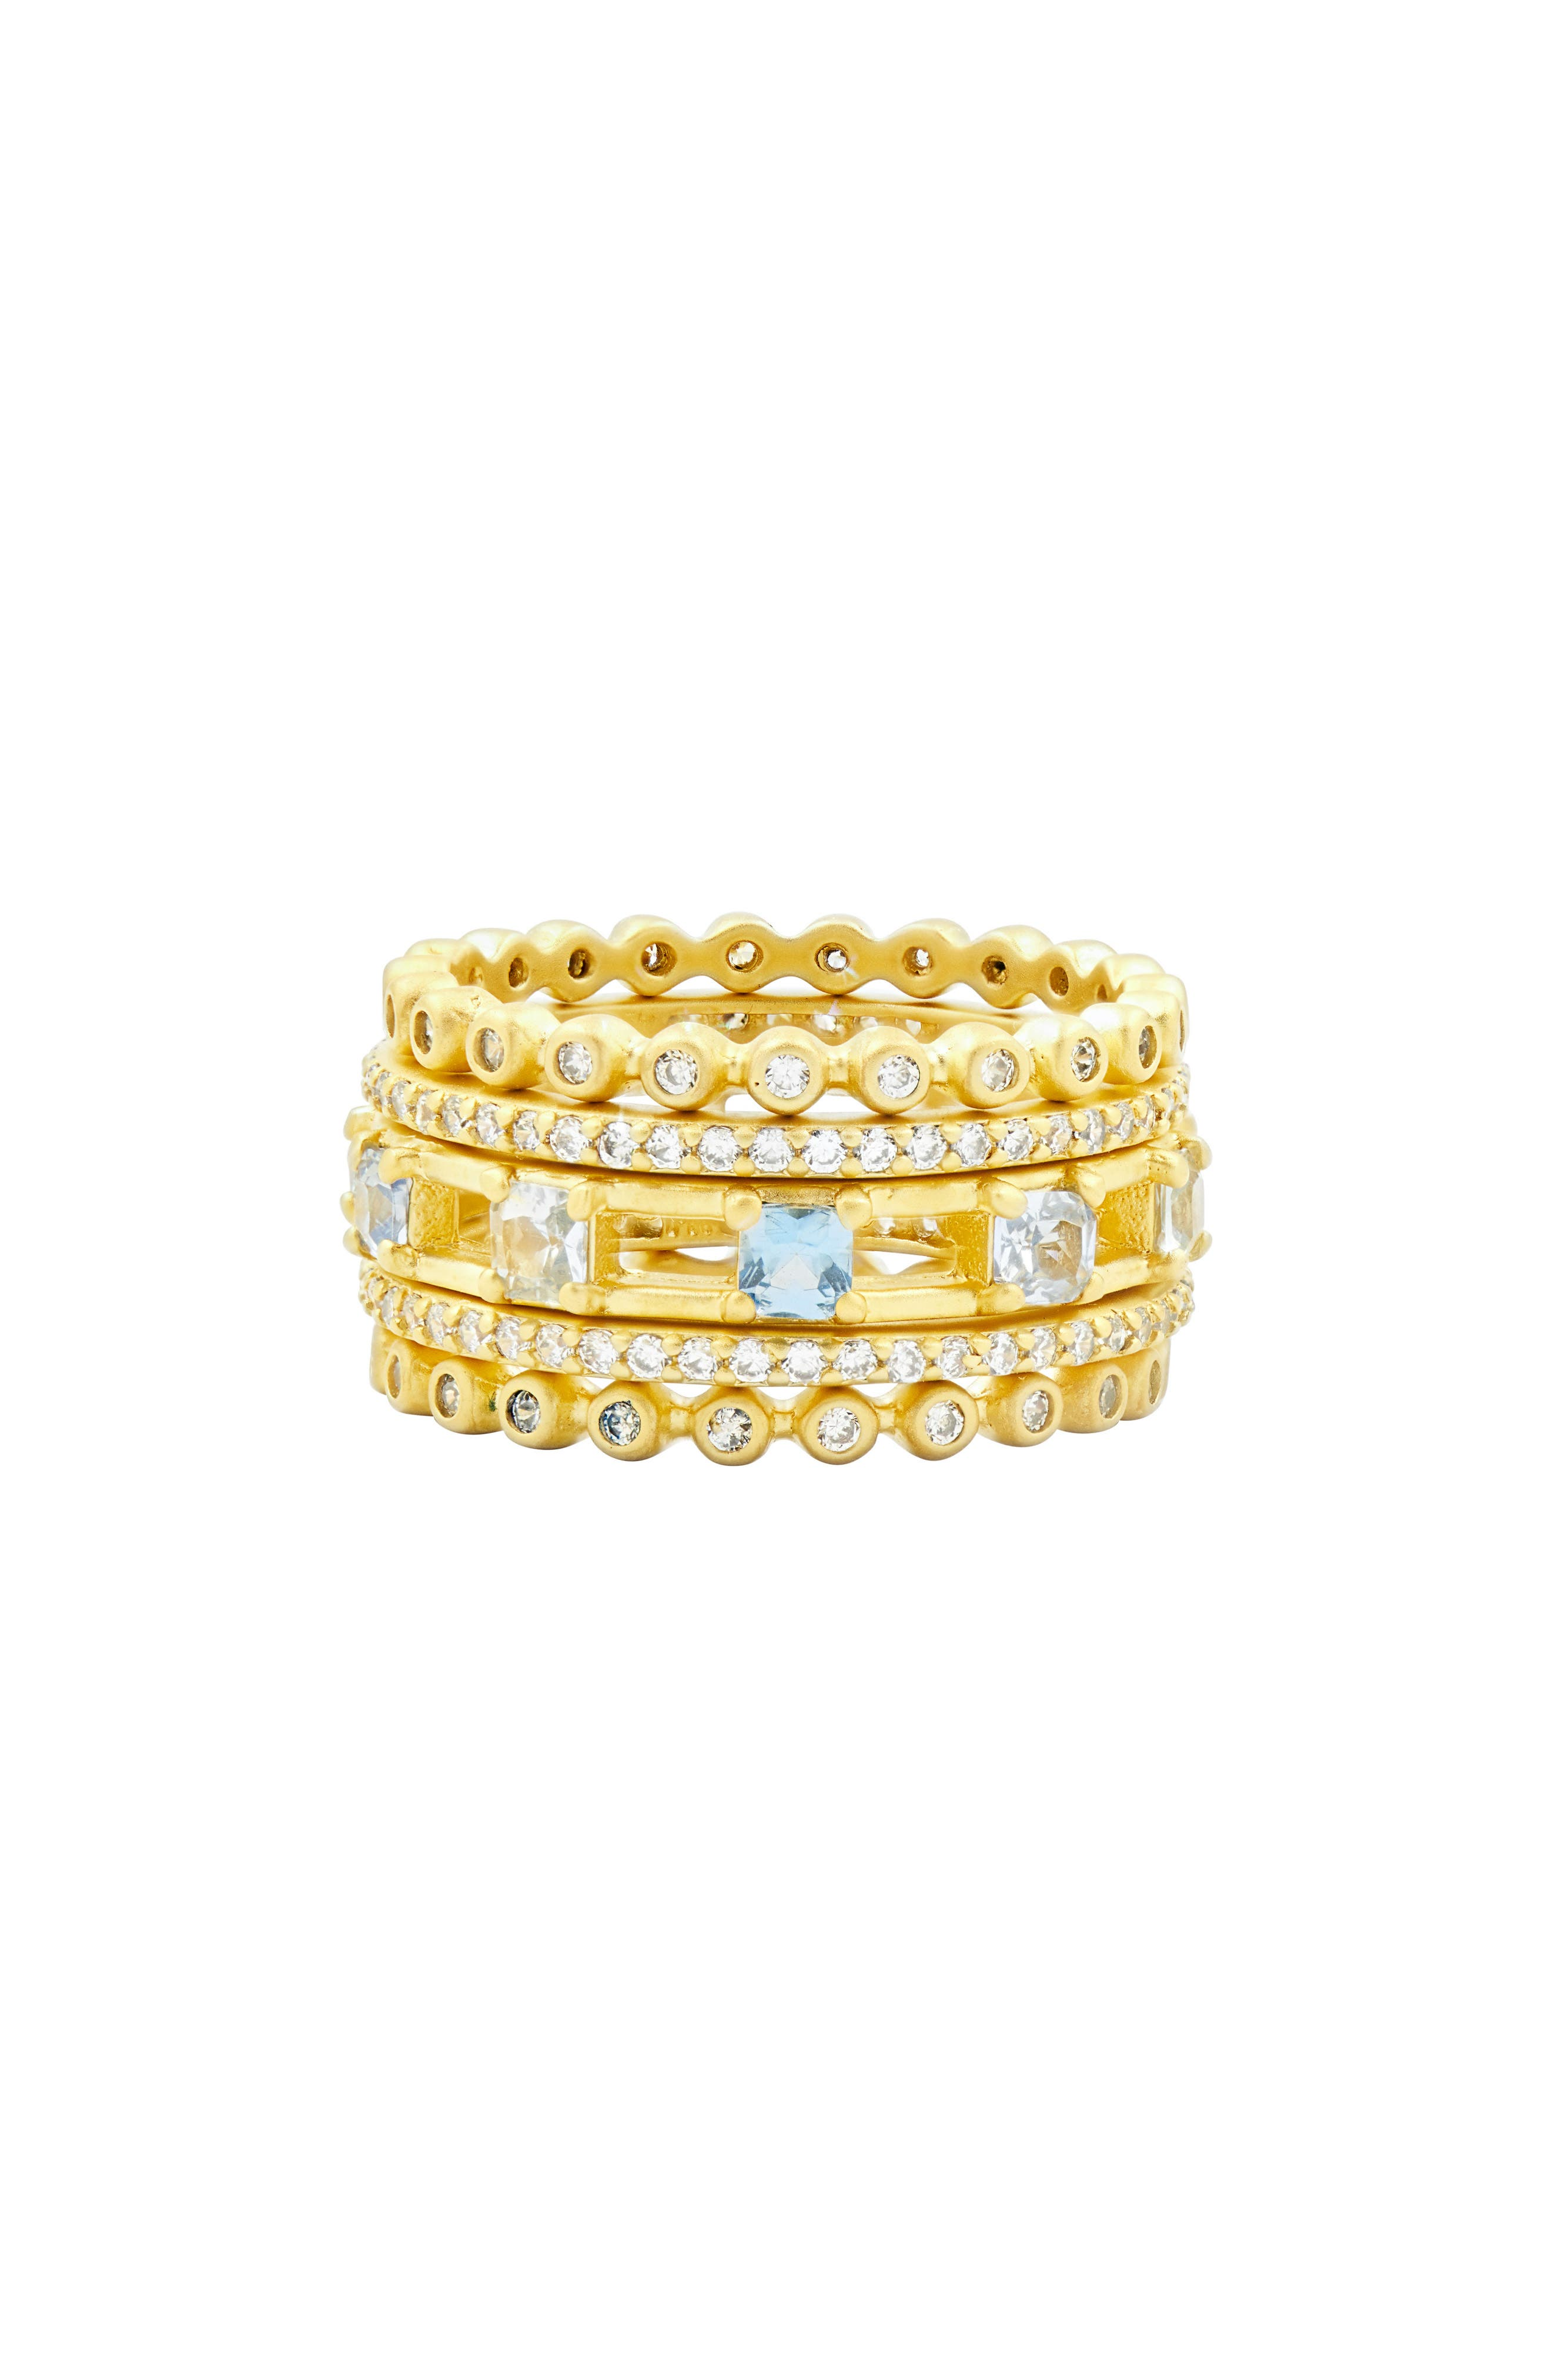 Main Image - FREIDA ROTHMAN Ocean Azure Cubic Zirconia Ring